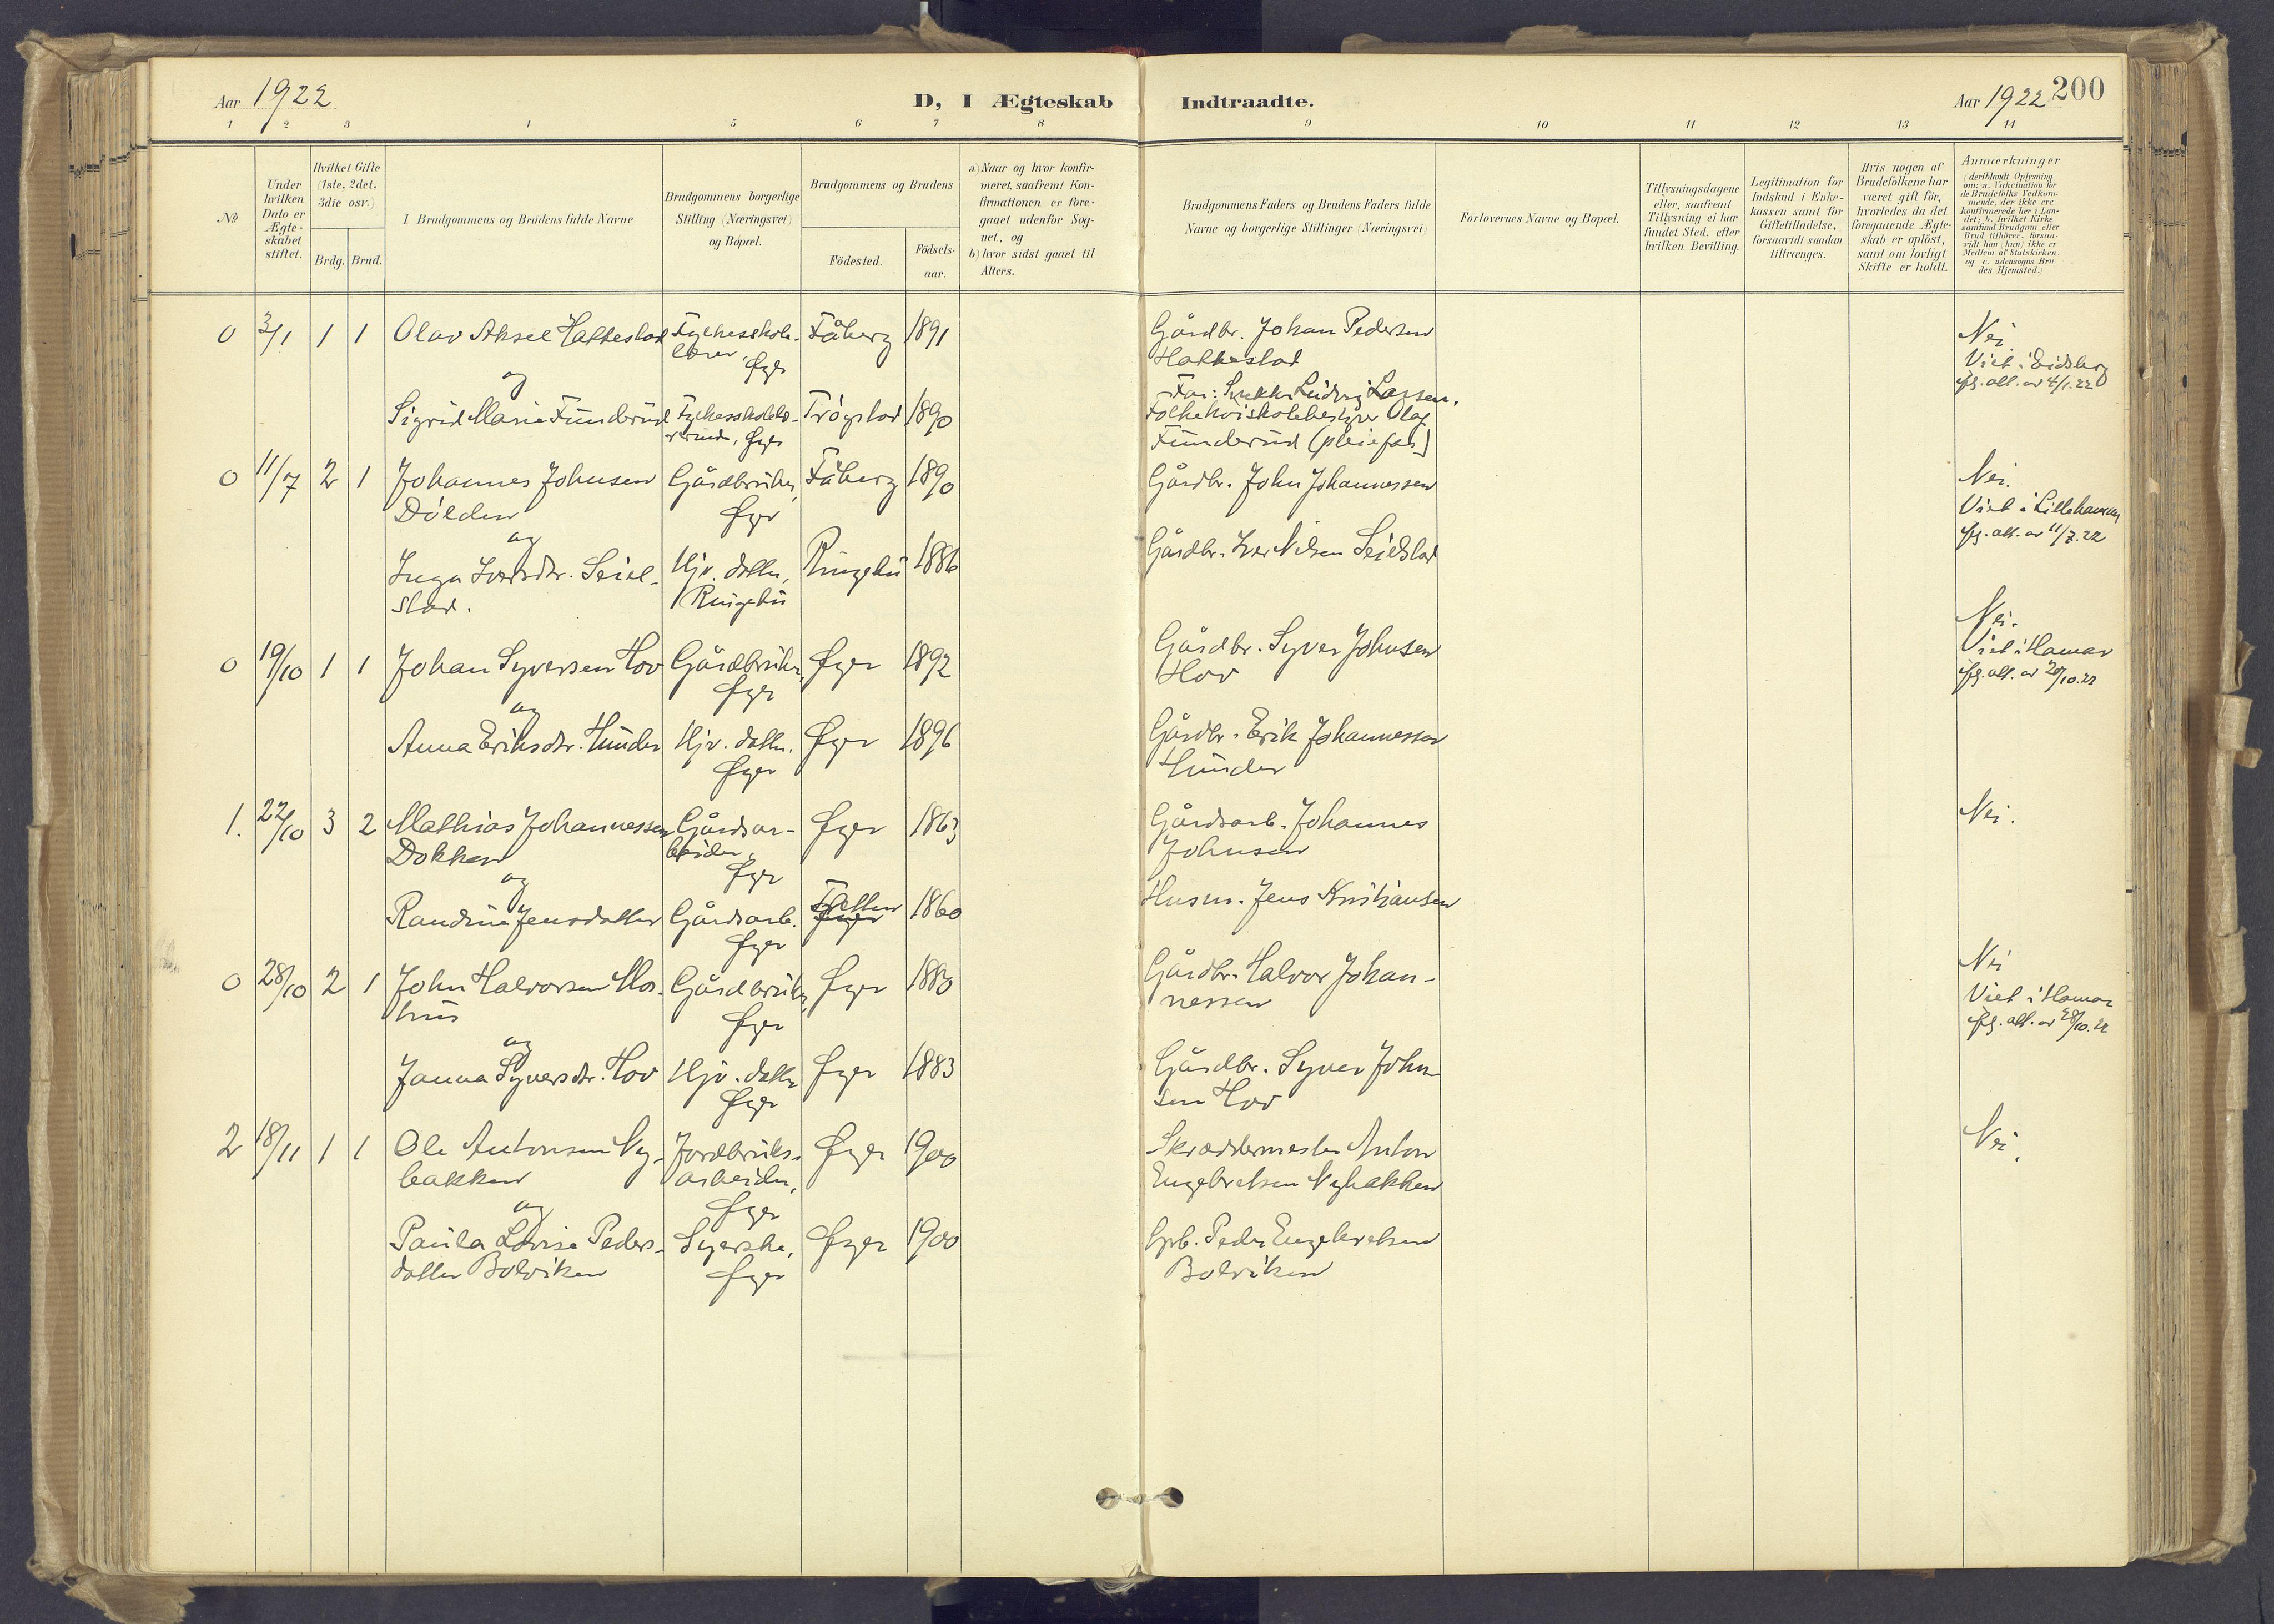 SAH, Øyer prestekontor, Ministerialbok nr. 12, 1897-1920, s. 200